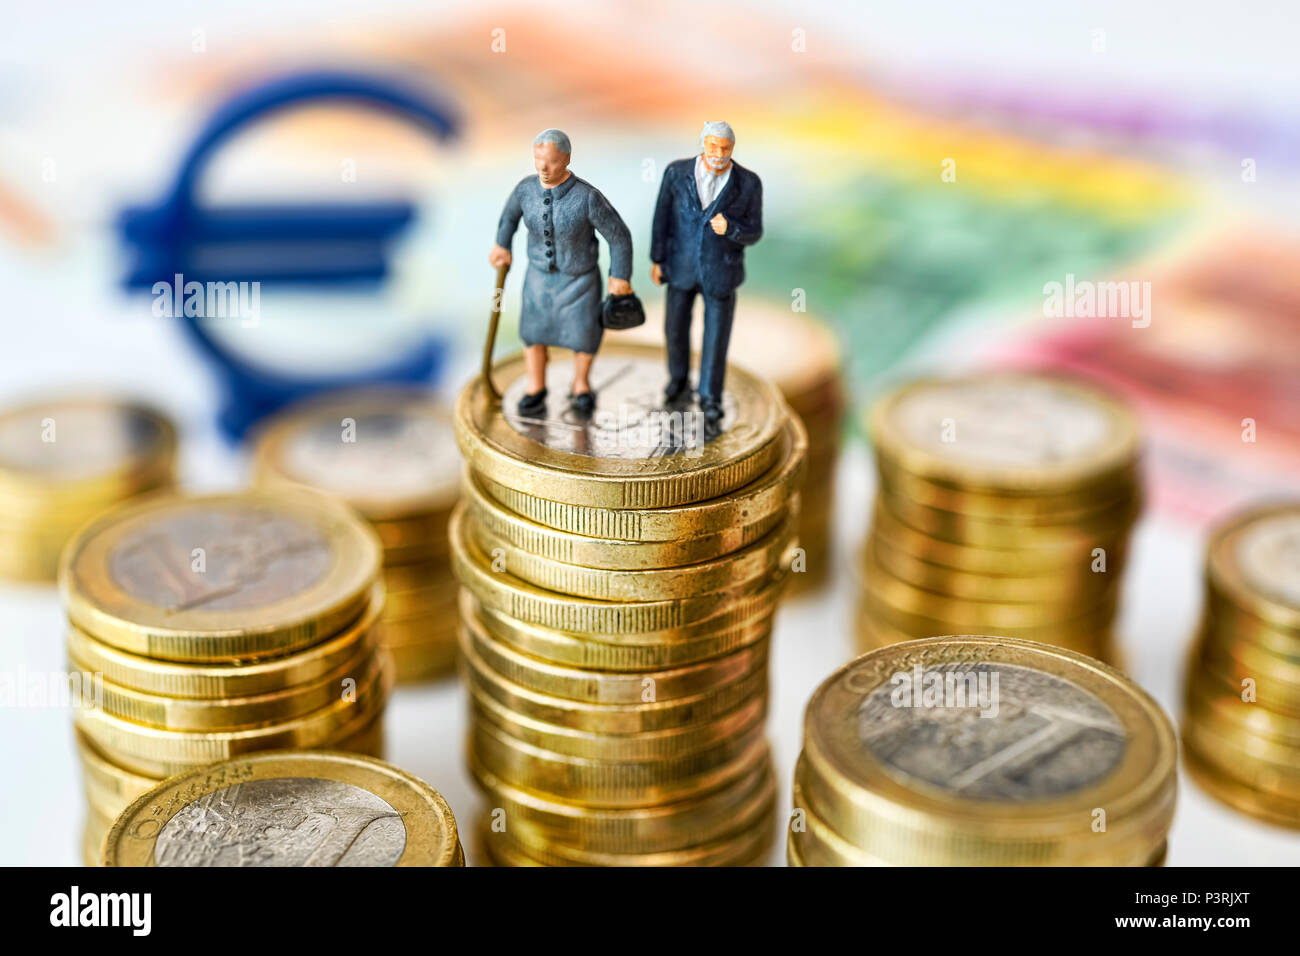 Senior couple on coins, Symbol photo Pension, Seniorenpaar auf Geldmünzen, Symbolfoto Rente Stock Photo